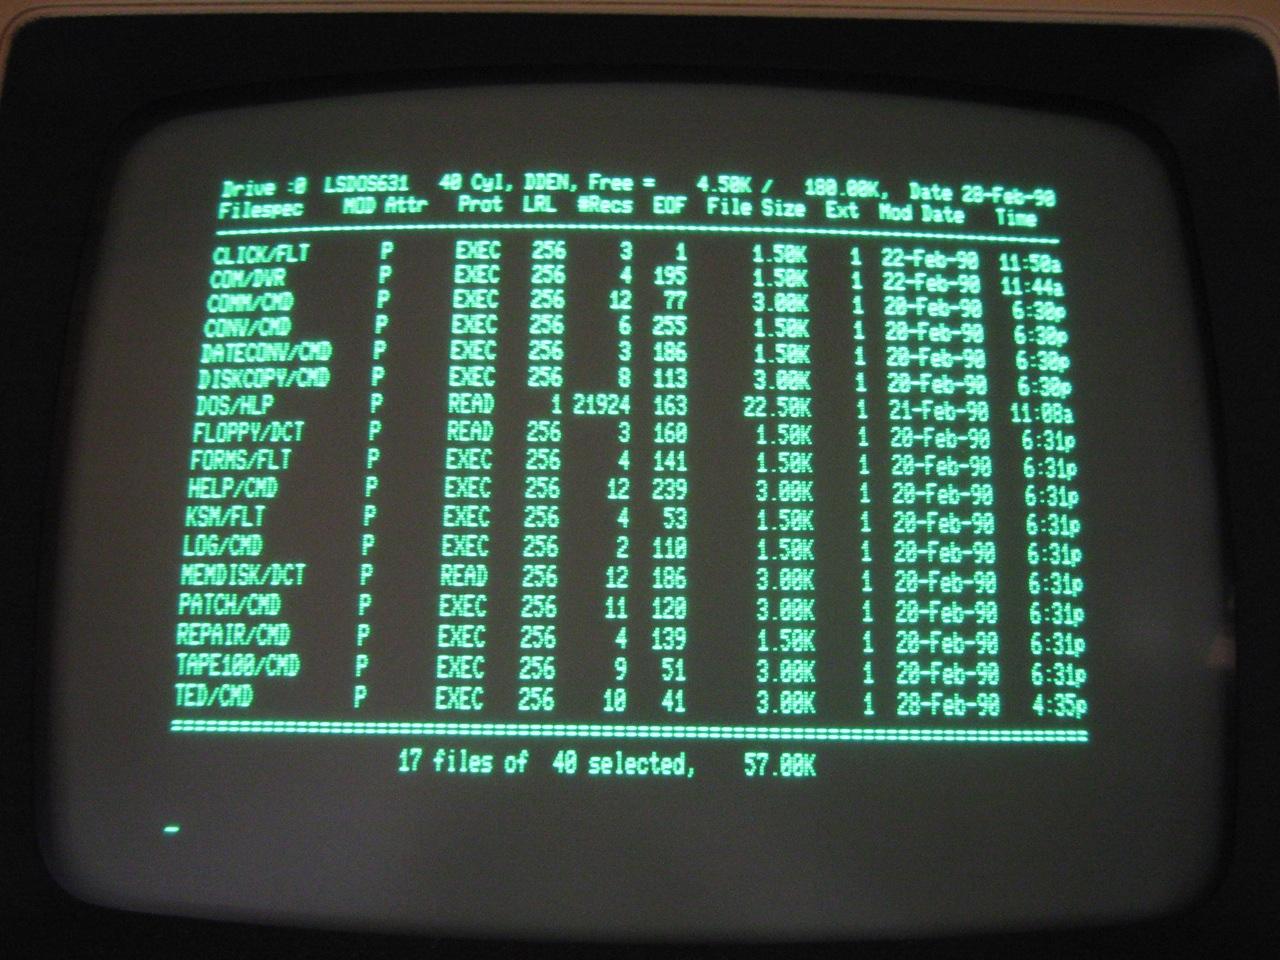 Tandy Radio Shack TRS-80 Model 4p Dos Boot Disk | nIGHTFALL